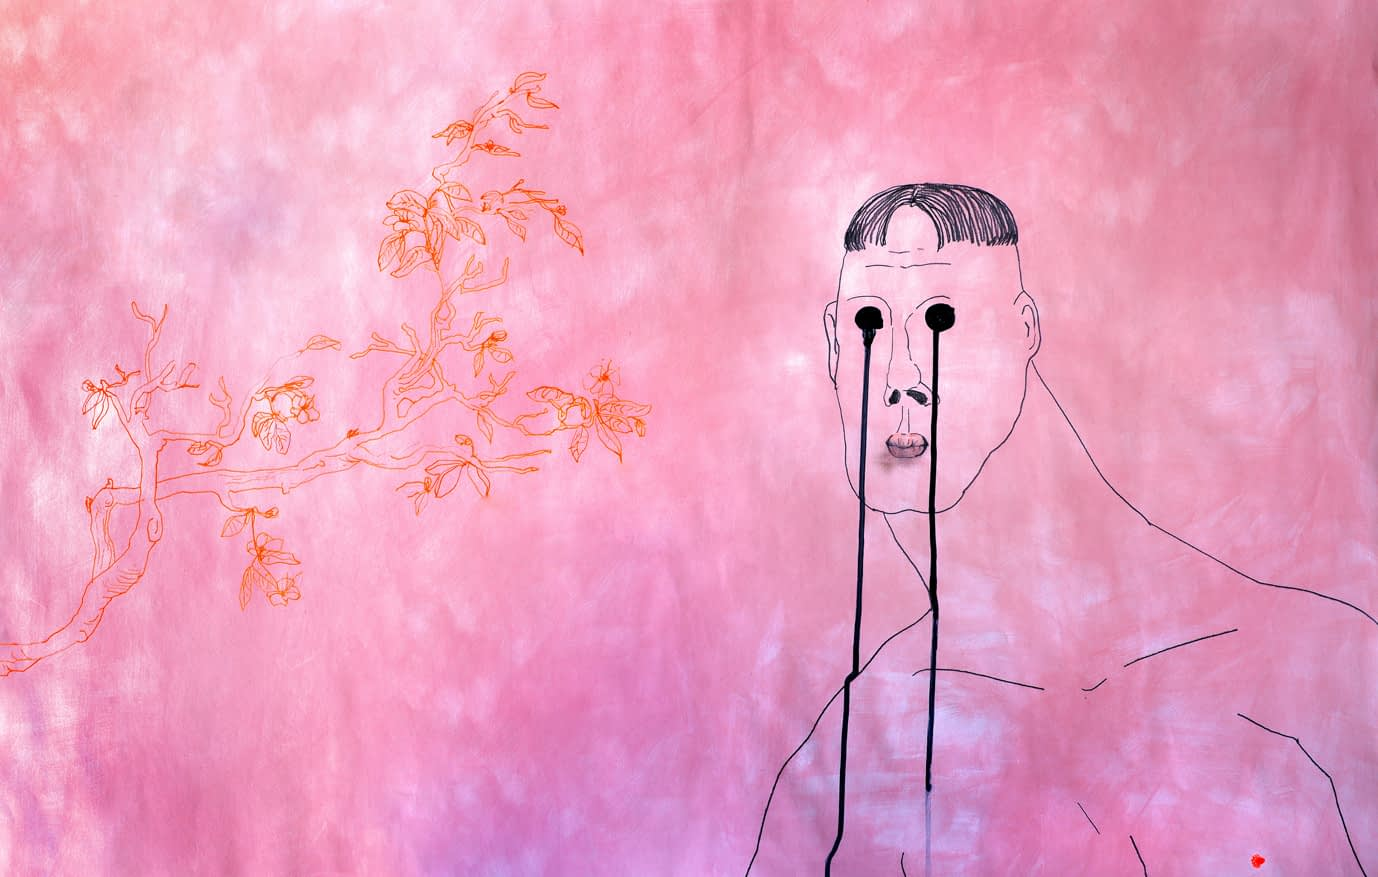 Daybed Radu Abraham ✕ Lea Rasovszky